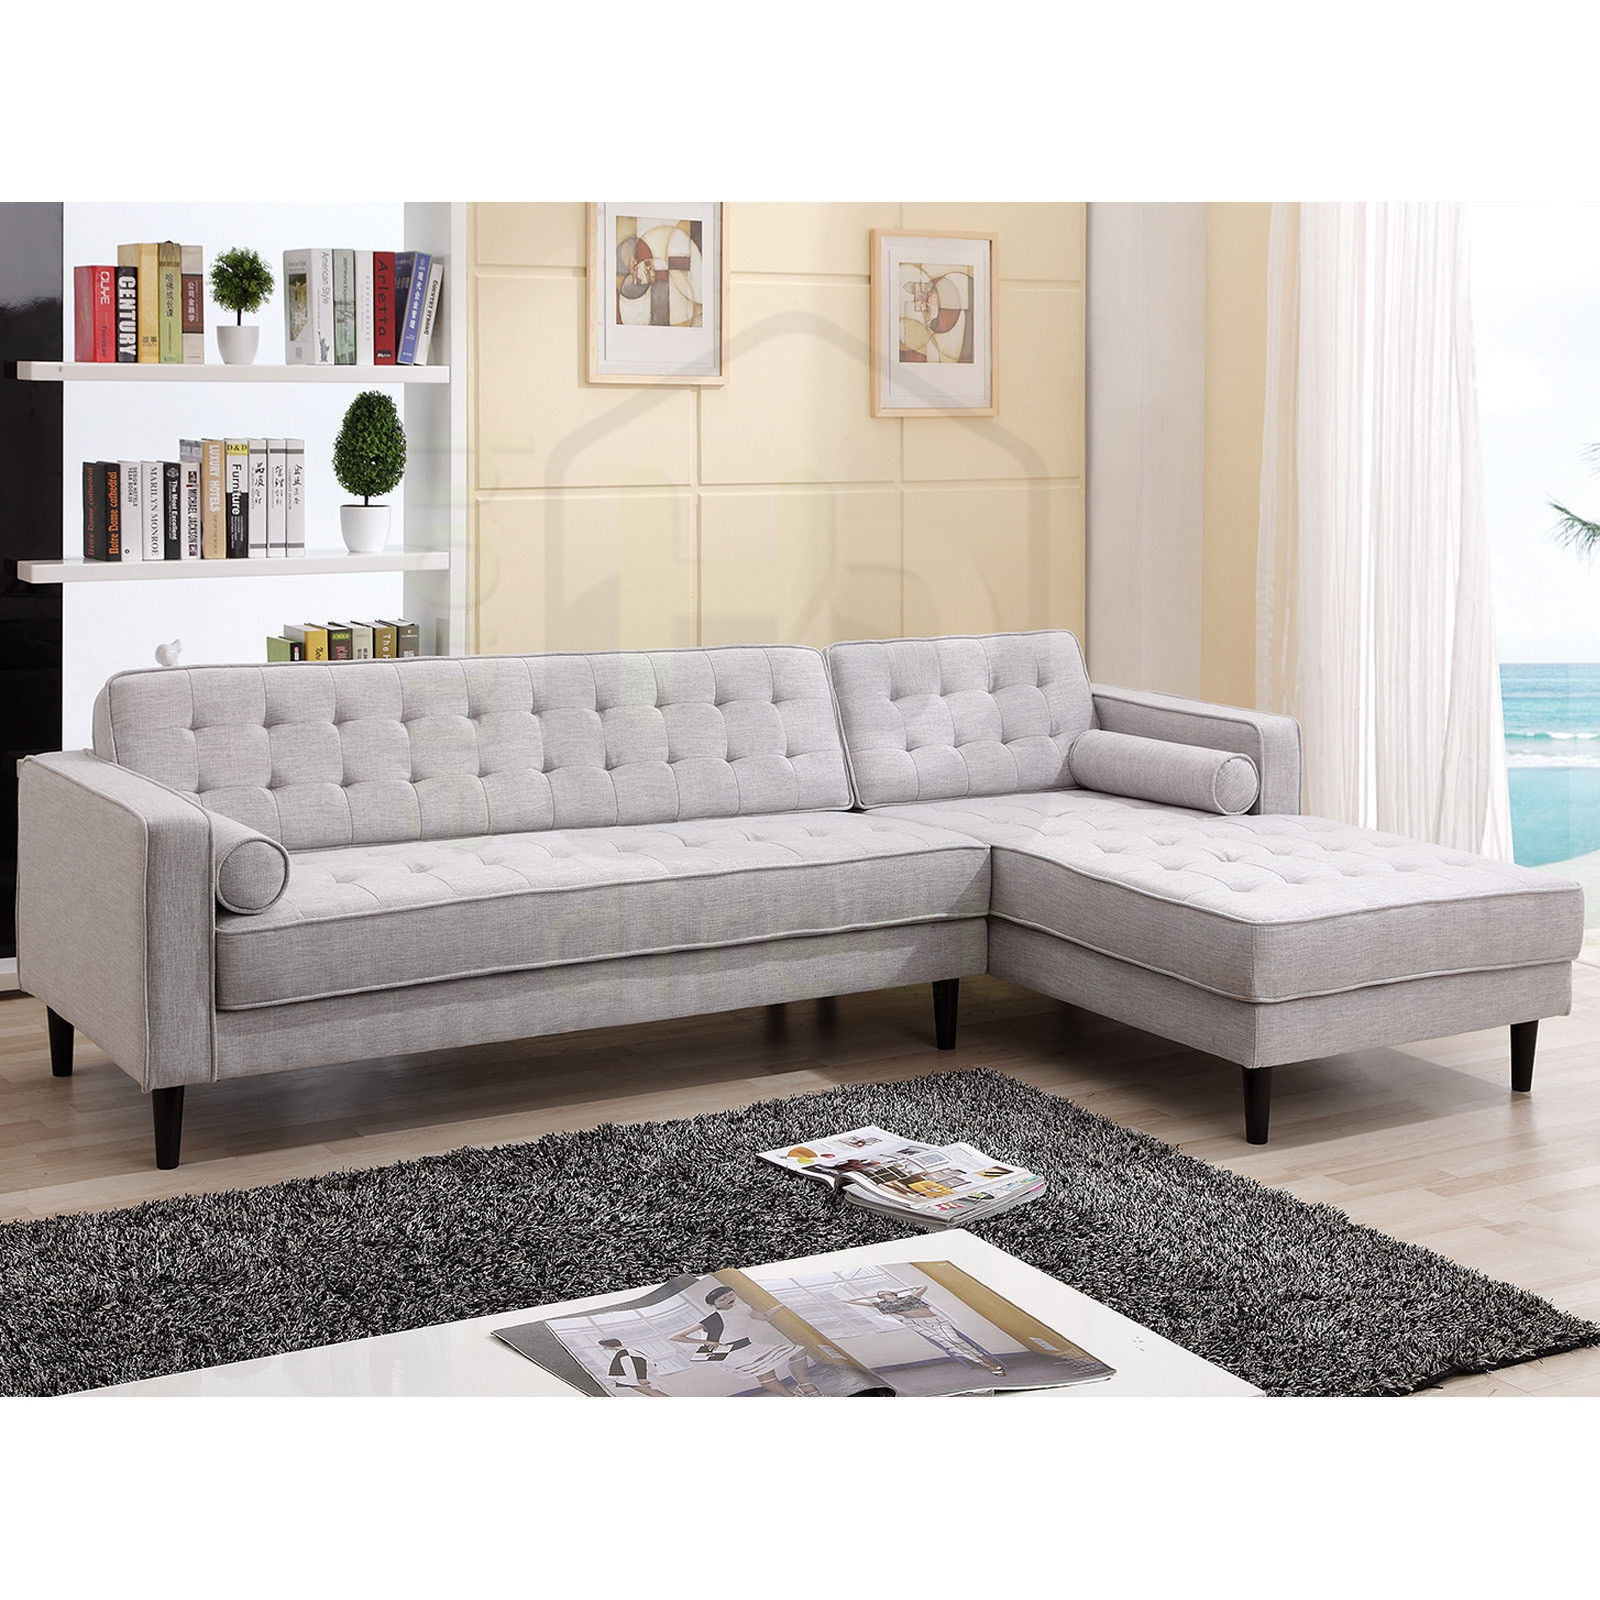 danish style sofa australia chadwick barker and stonehouse aiden scandinavian with chaise right ebay